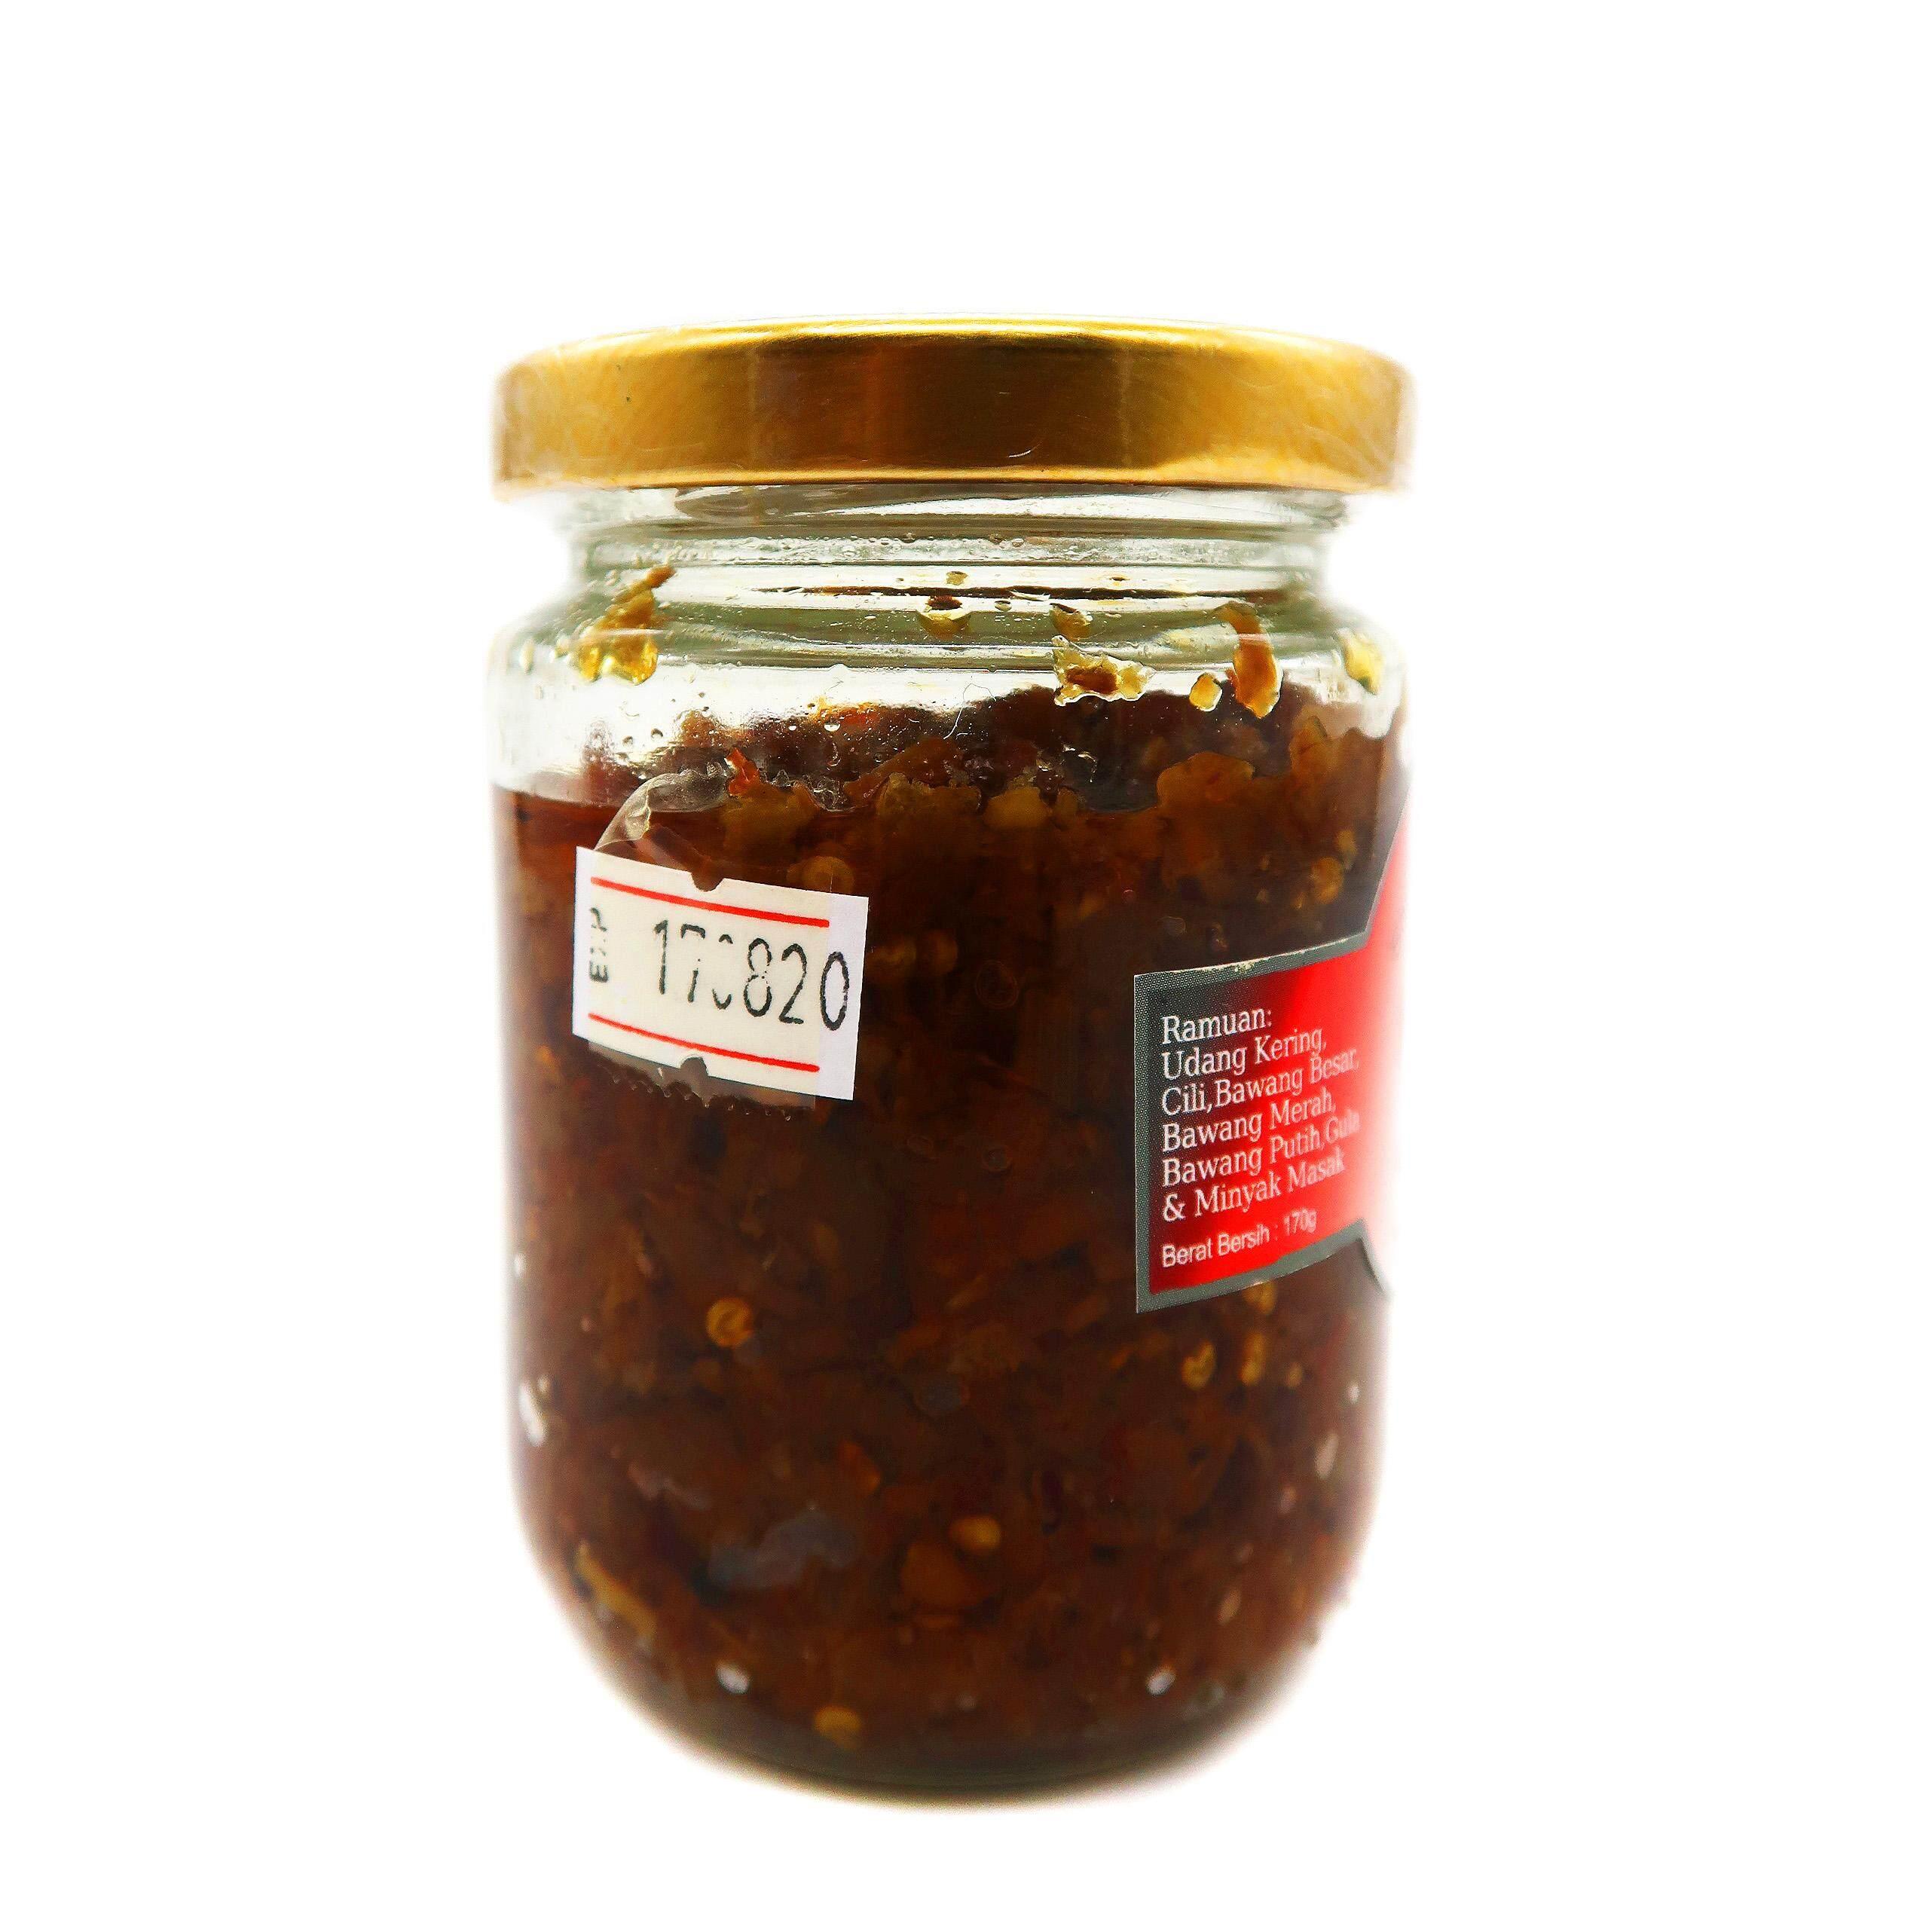 MENAQ Sambal Udang Pedas Homemade Recipe 170g